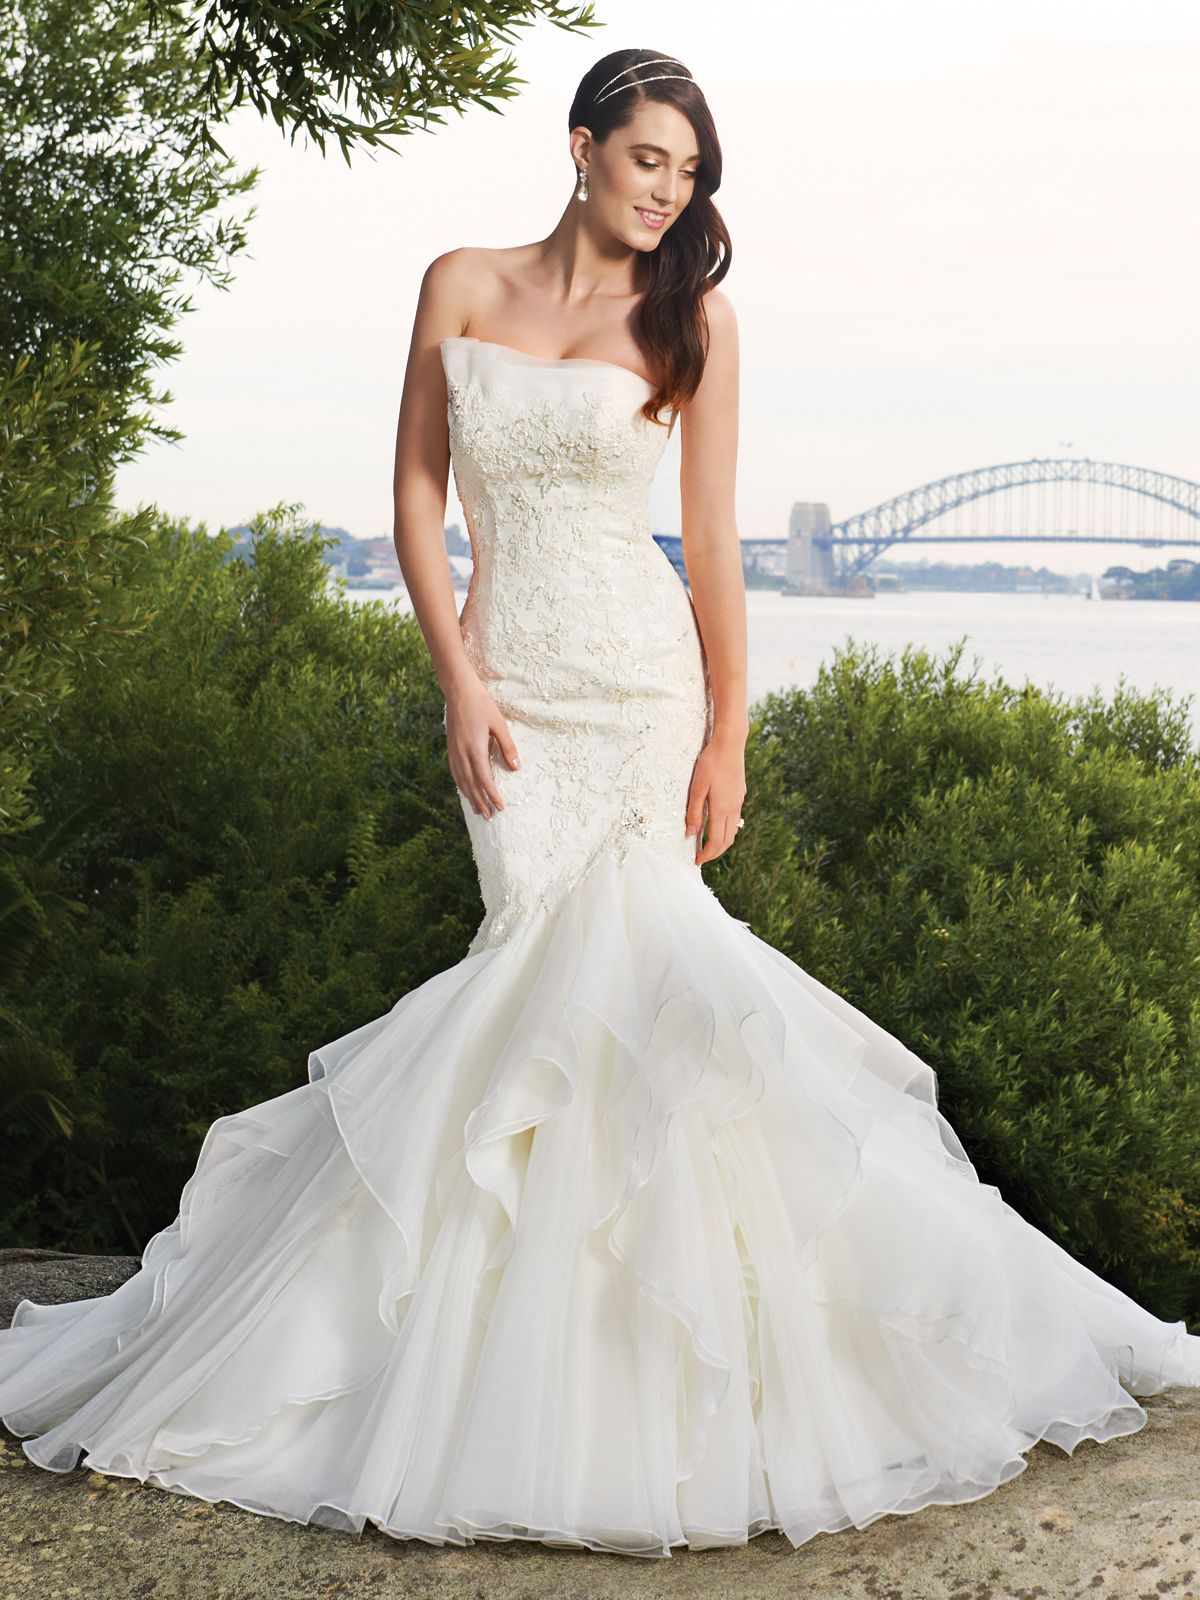 Vestidos de novia para verano 2013 Sophia Tolli   Boda Hoy ...